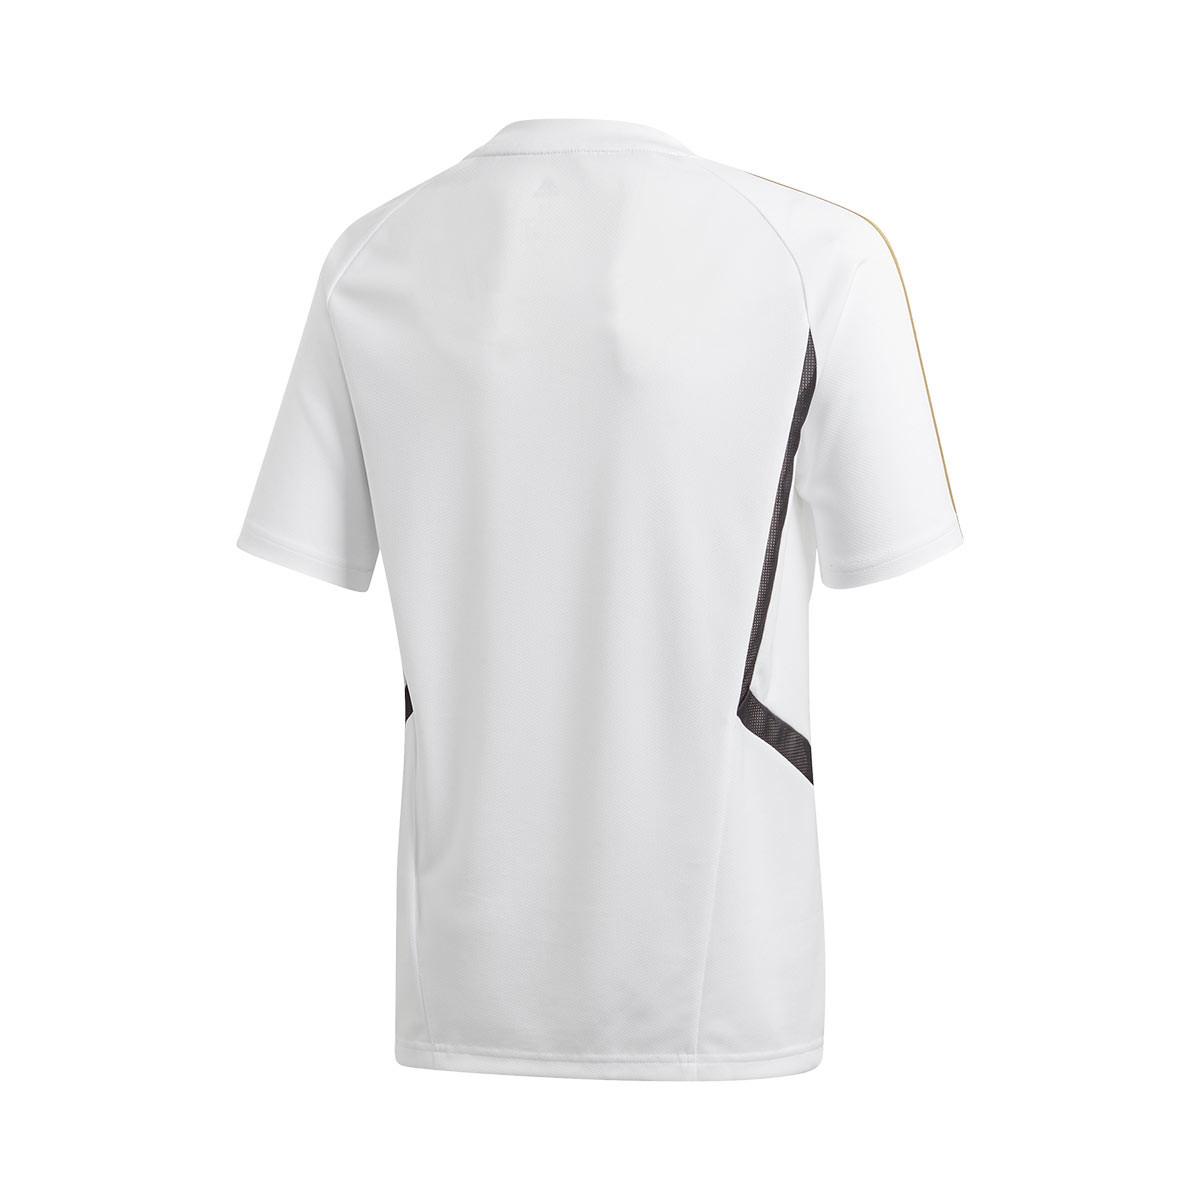 new concept 62be7 d0e82 Camiseta Real Madrid Training 2019-2020 Niño White-Dark football gold